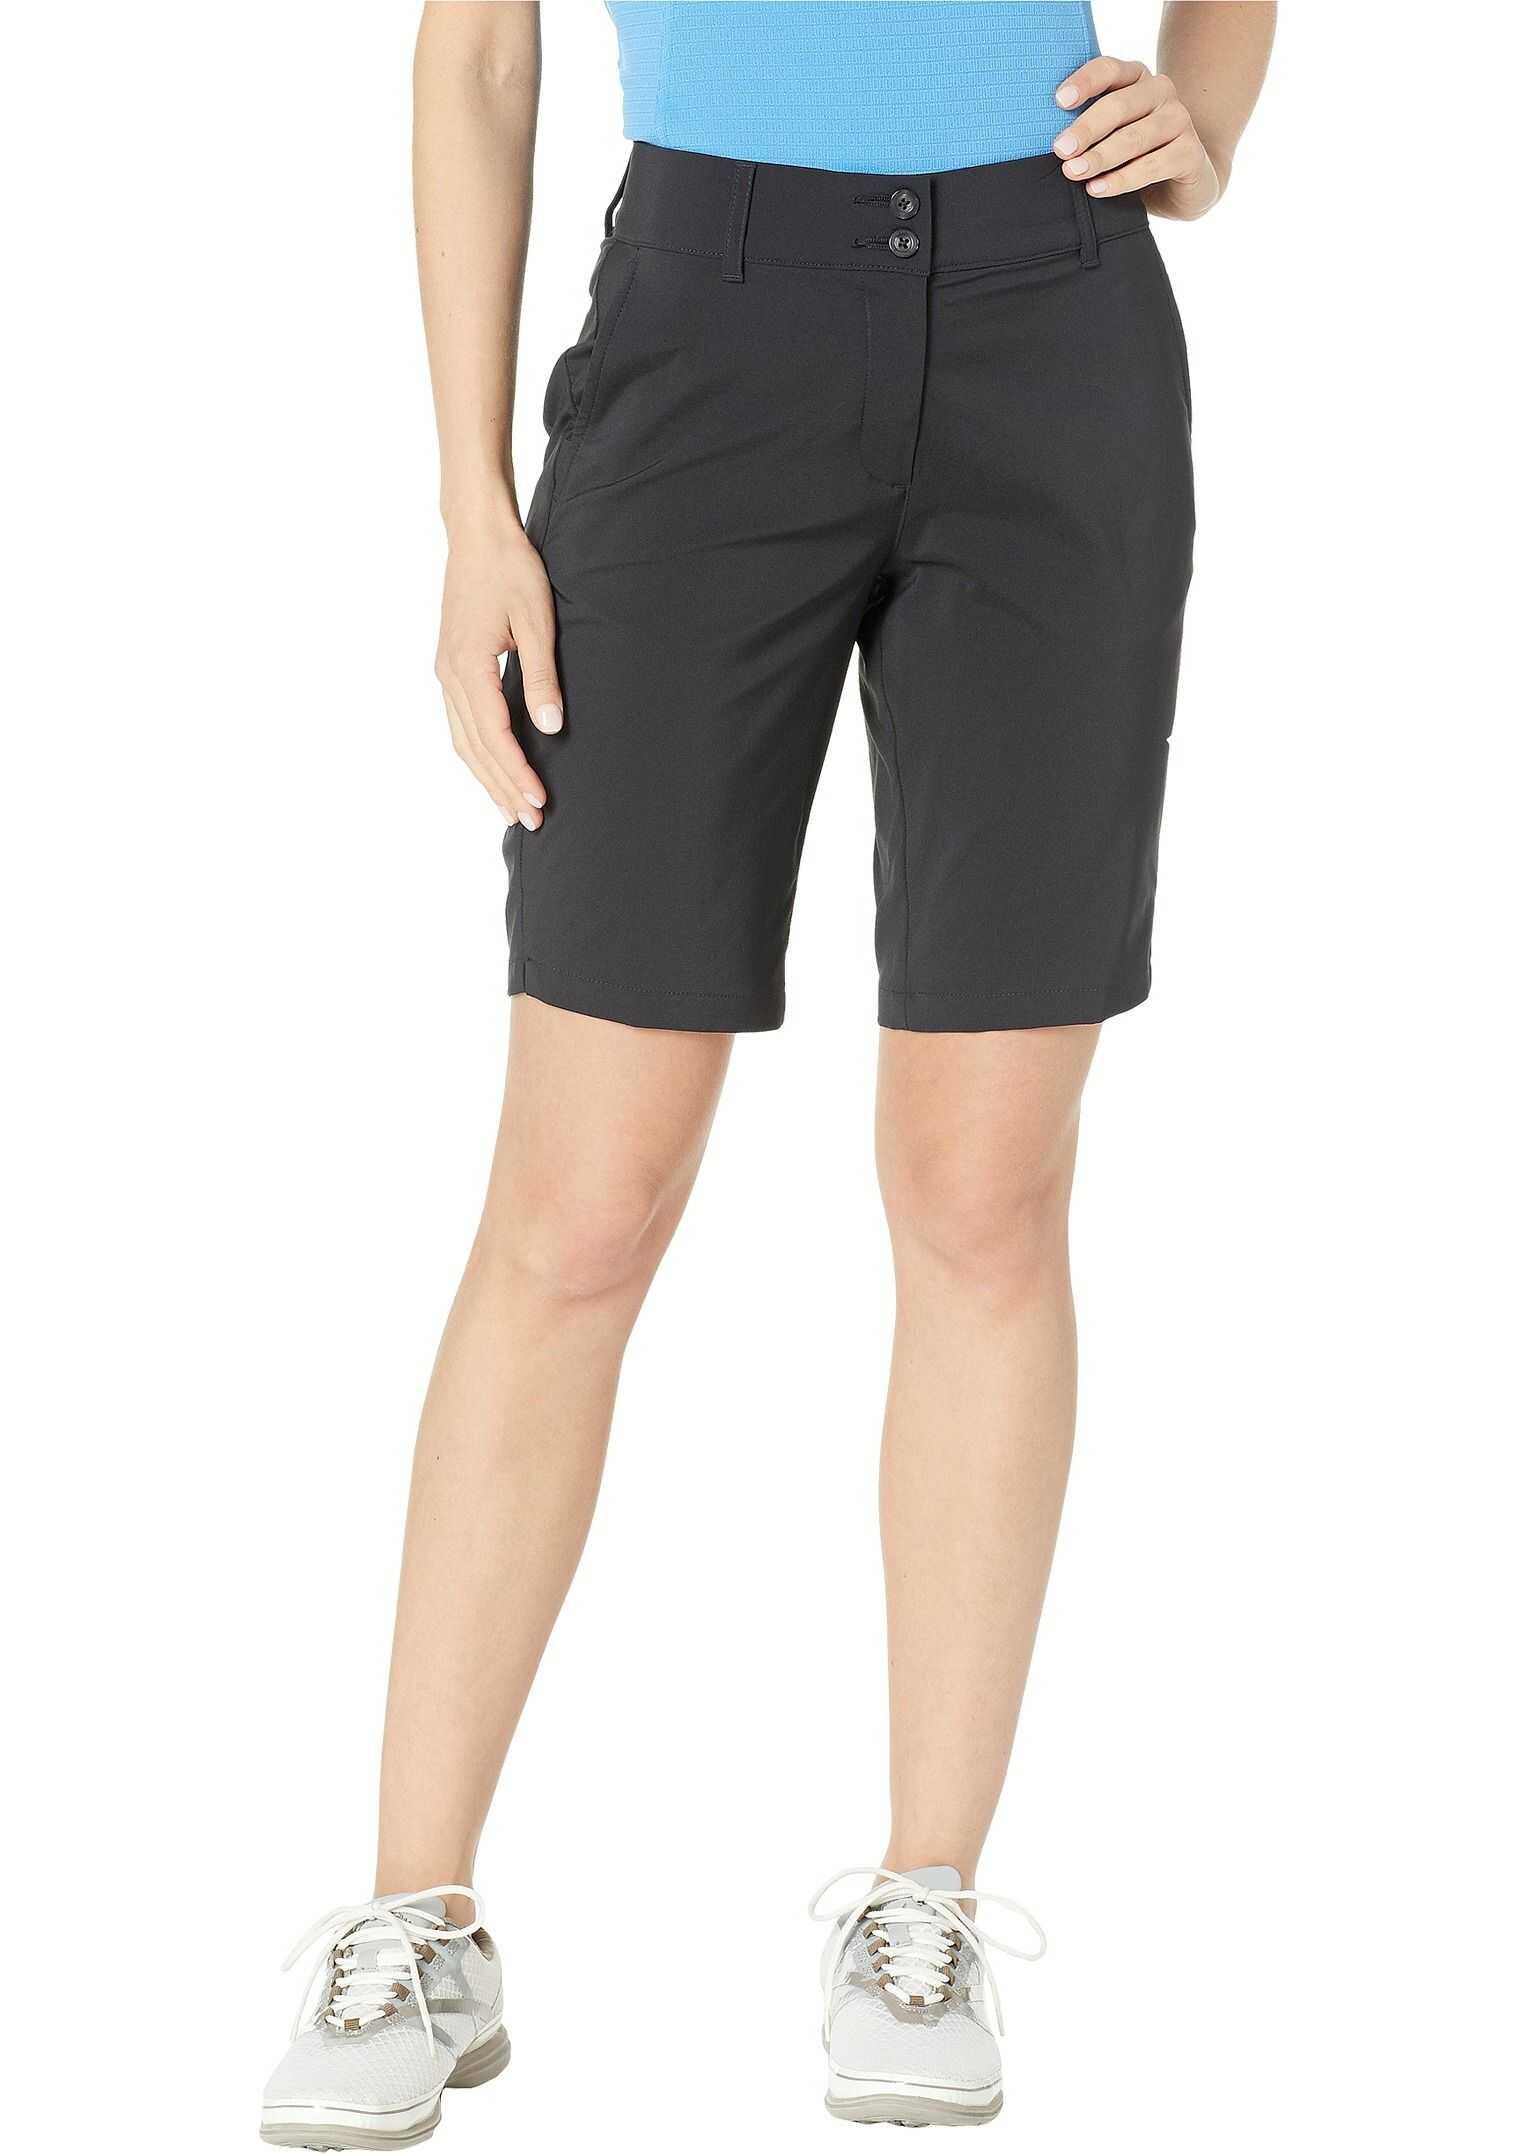 SKECHERS High Side Bermuda Shorts Black